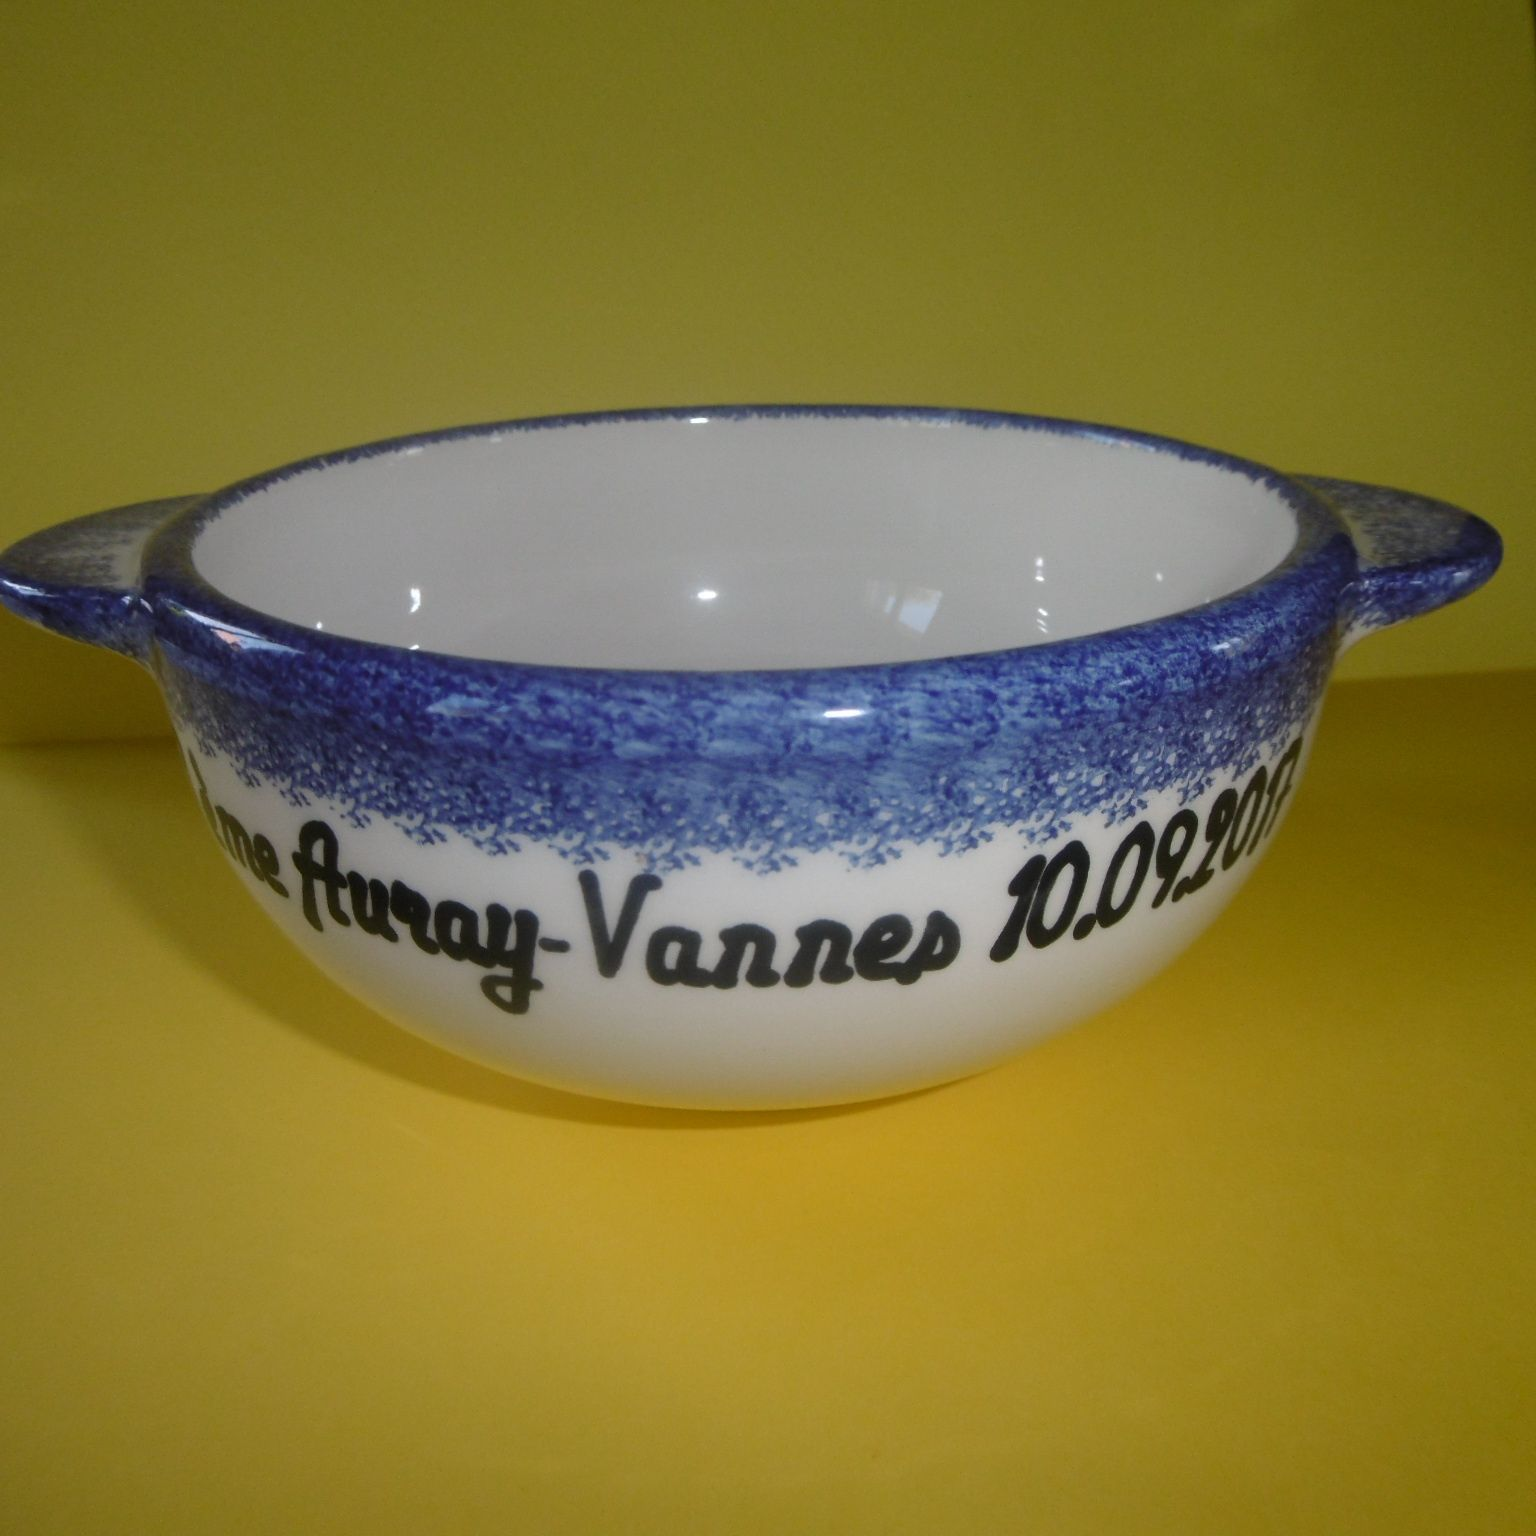 43 ème Semi Auray-Vannes